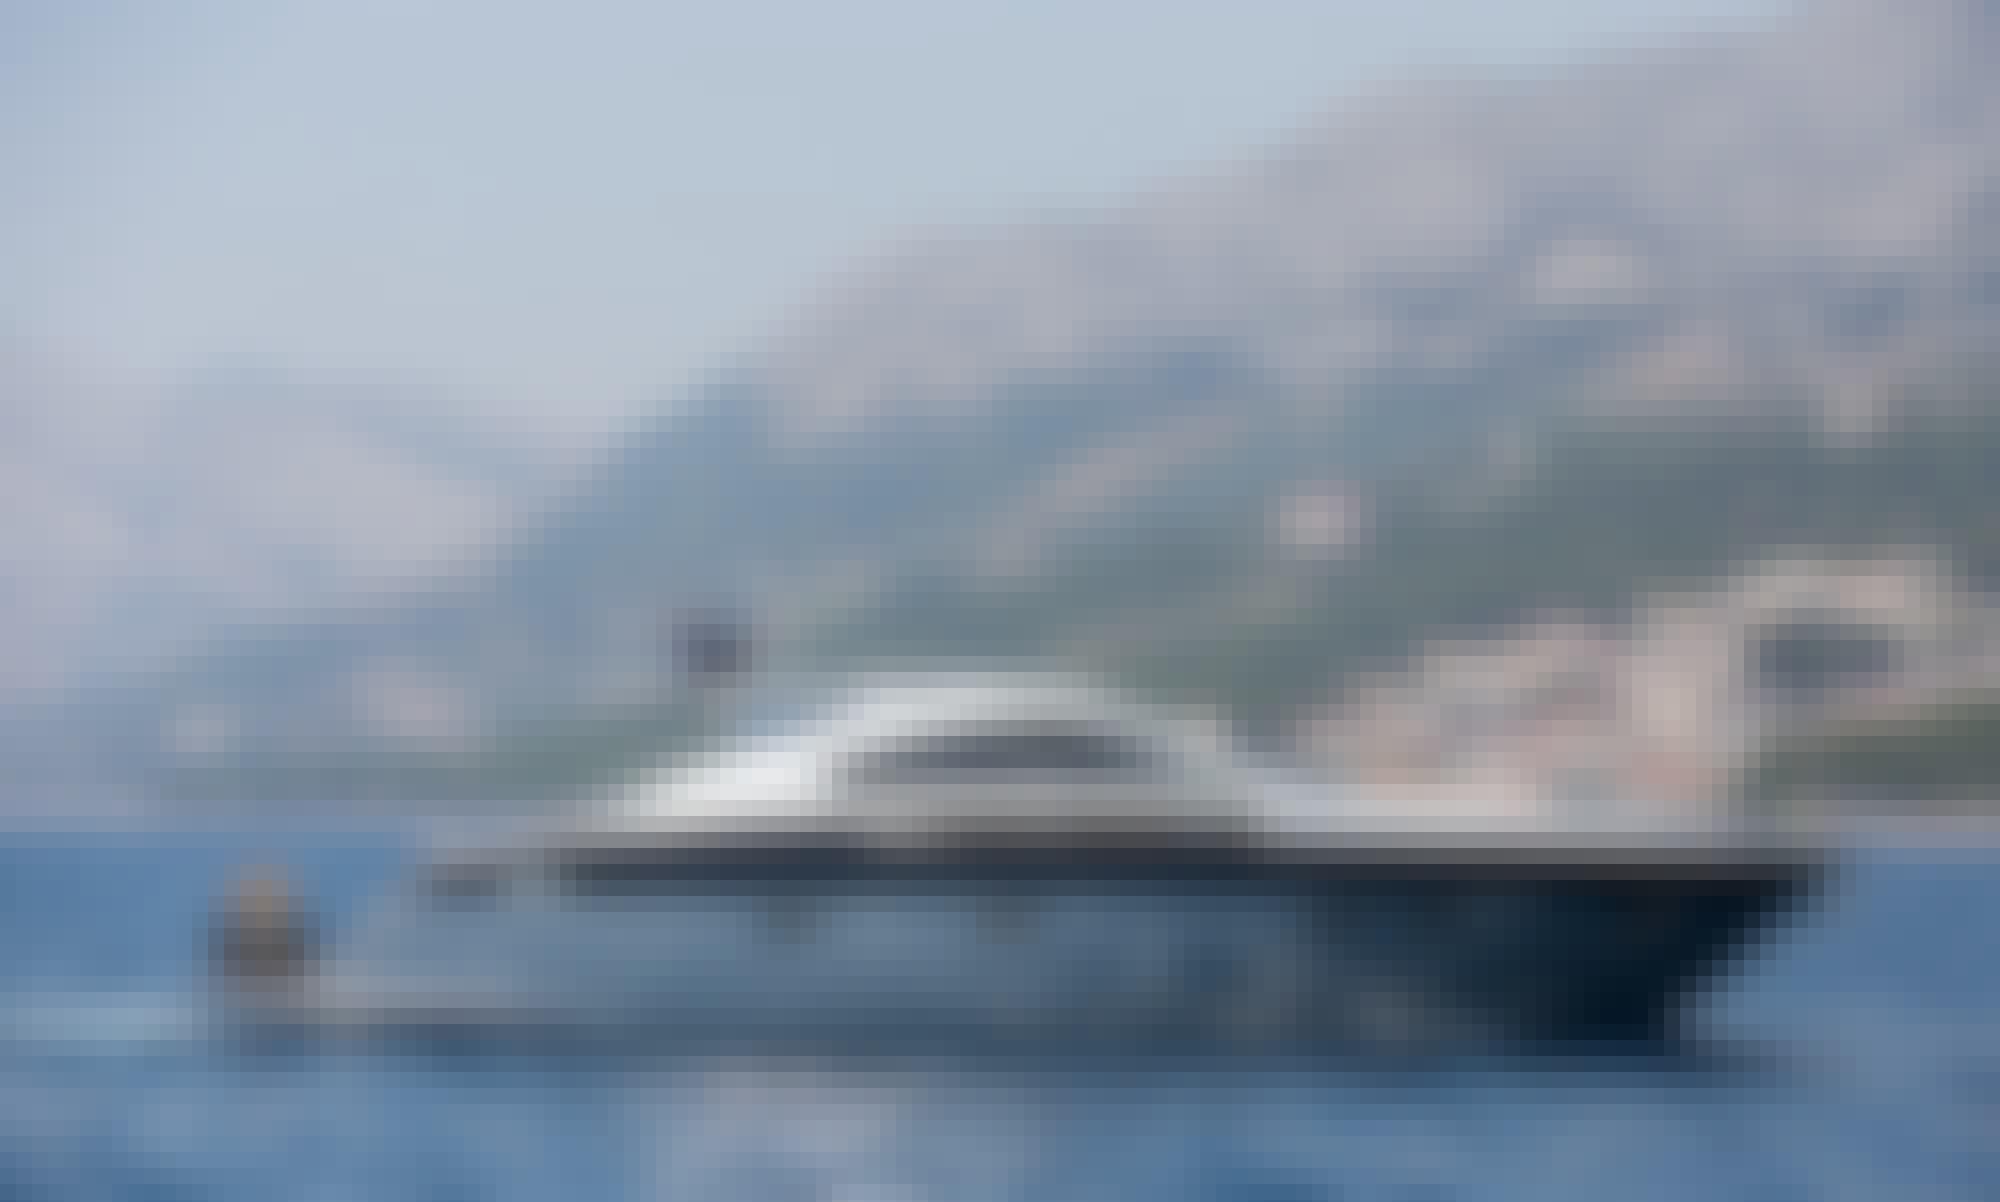 Motor Yacht Charter - PearlSea 56 Coupe - in Baška Voda, Split, Zadar, Dalmatia